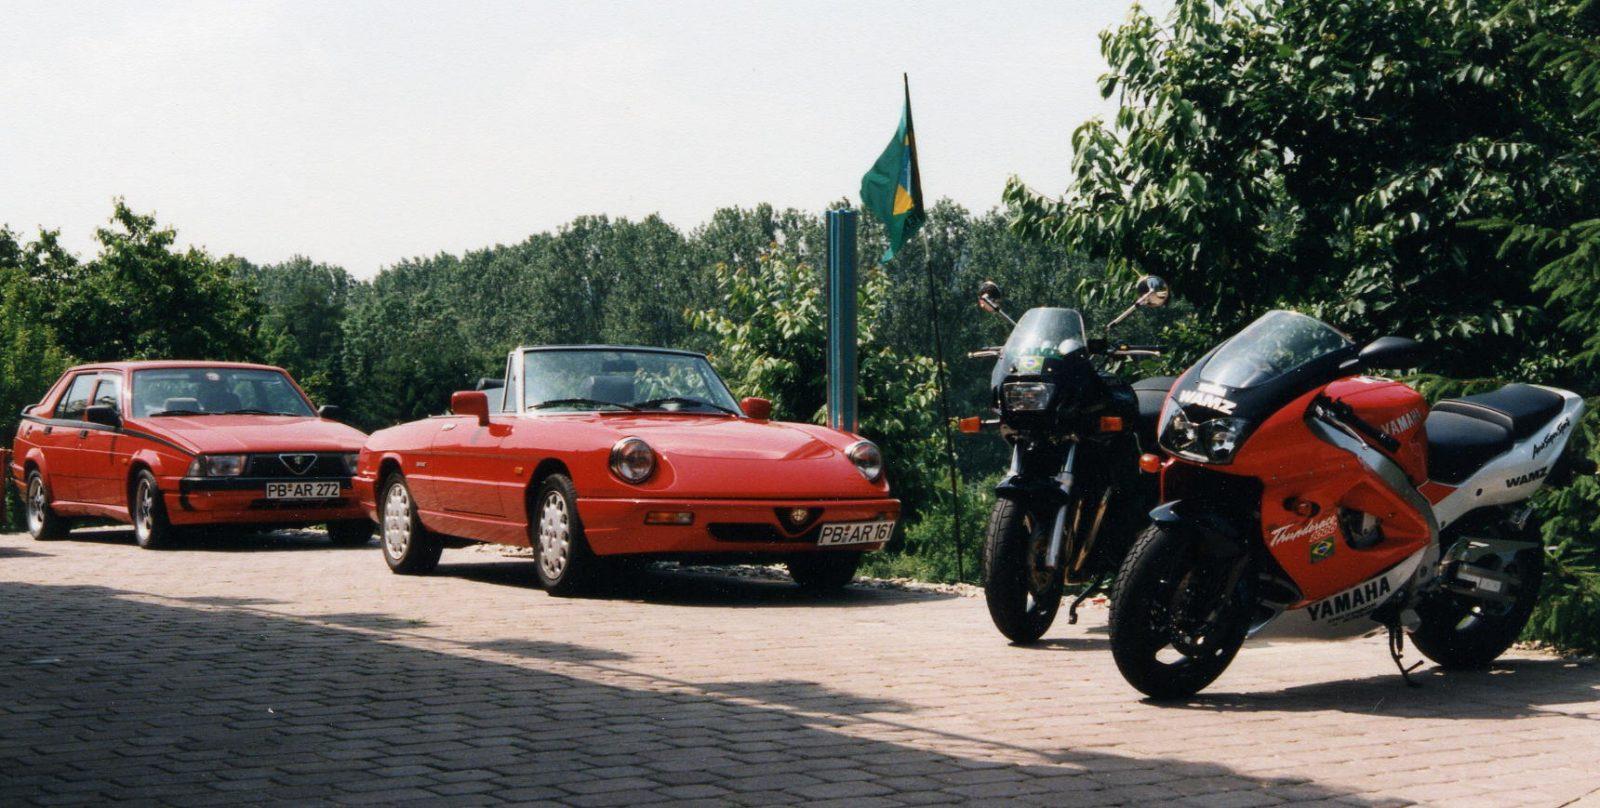 G1996 FW 4 Fahrzeuge